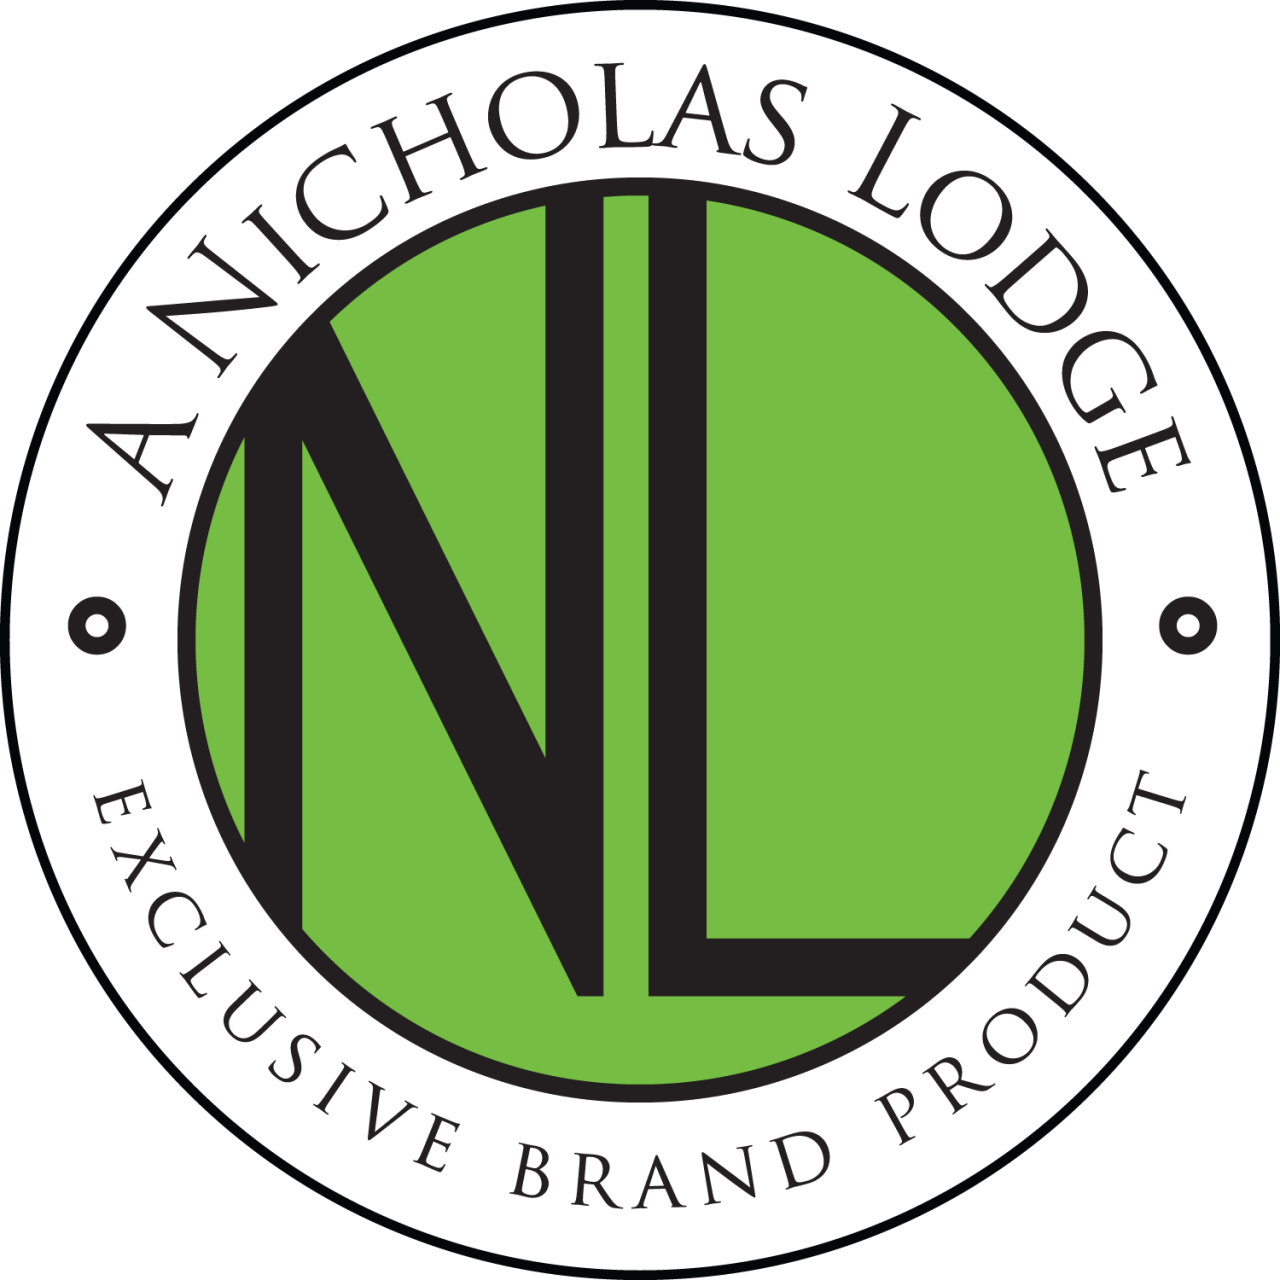 Nicholas-Lodge-Circle-Logo-Clear2